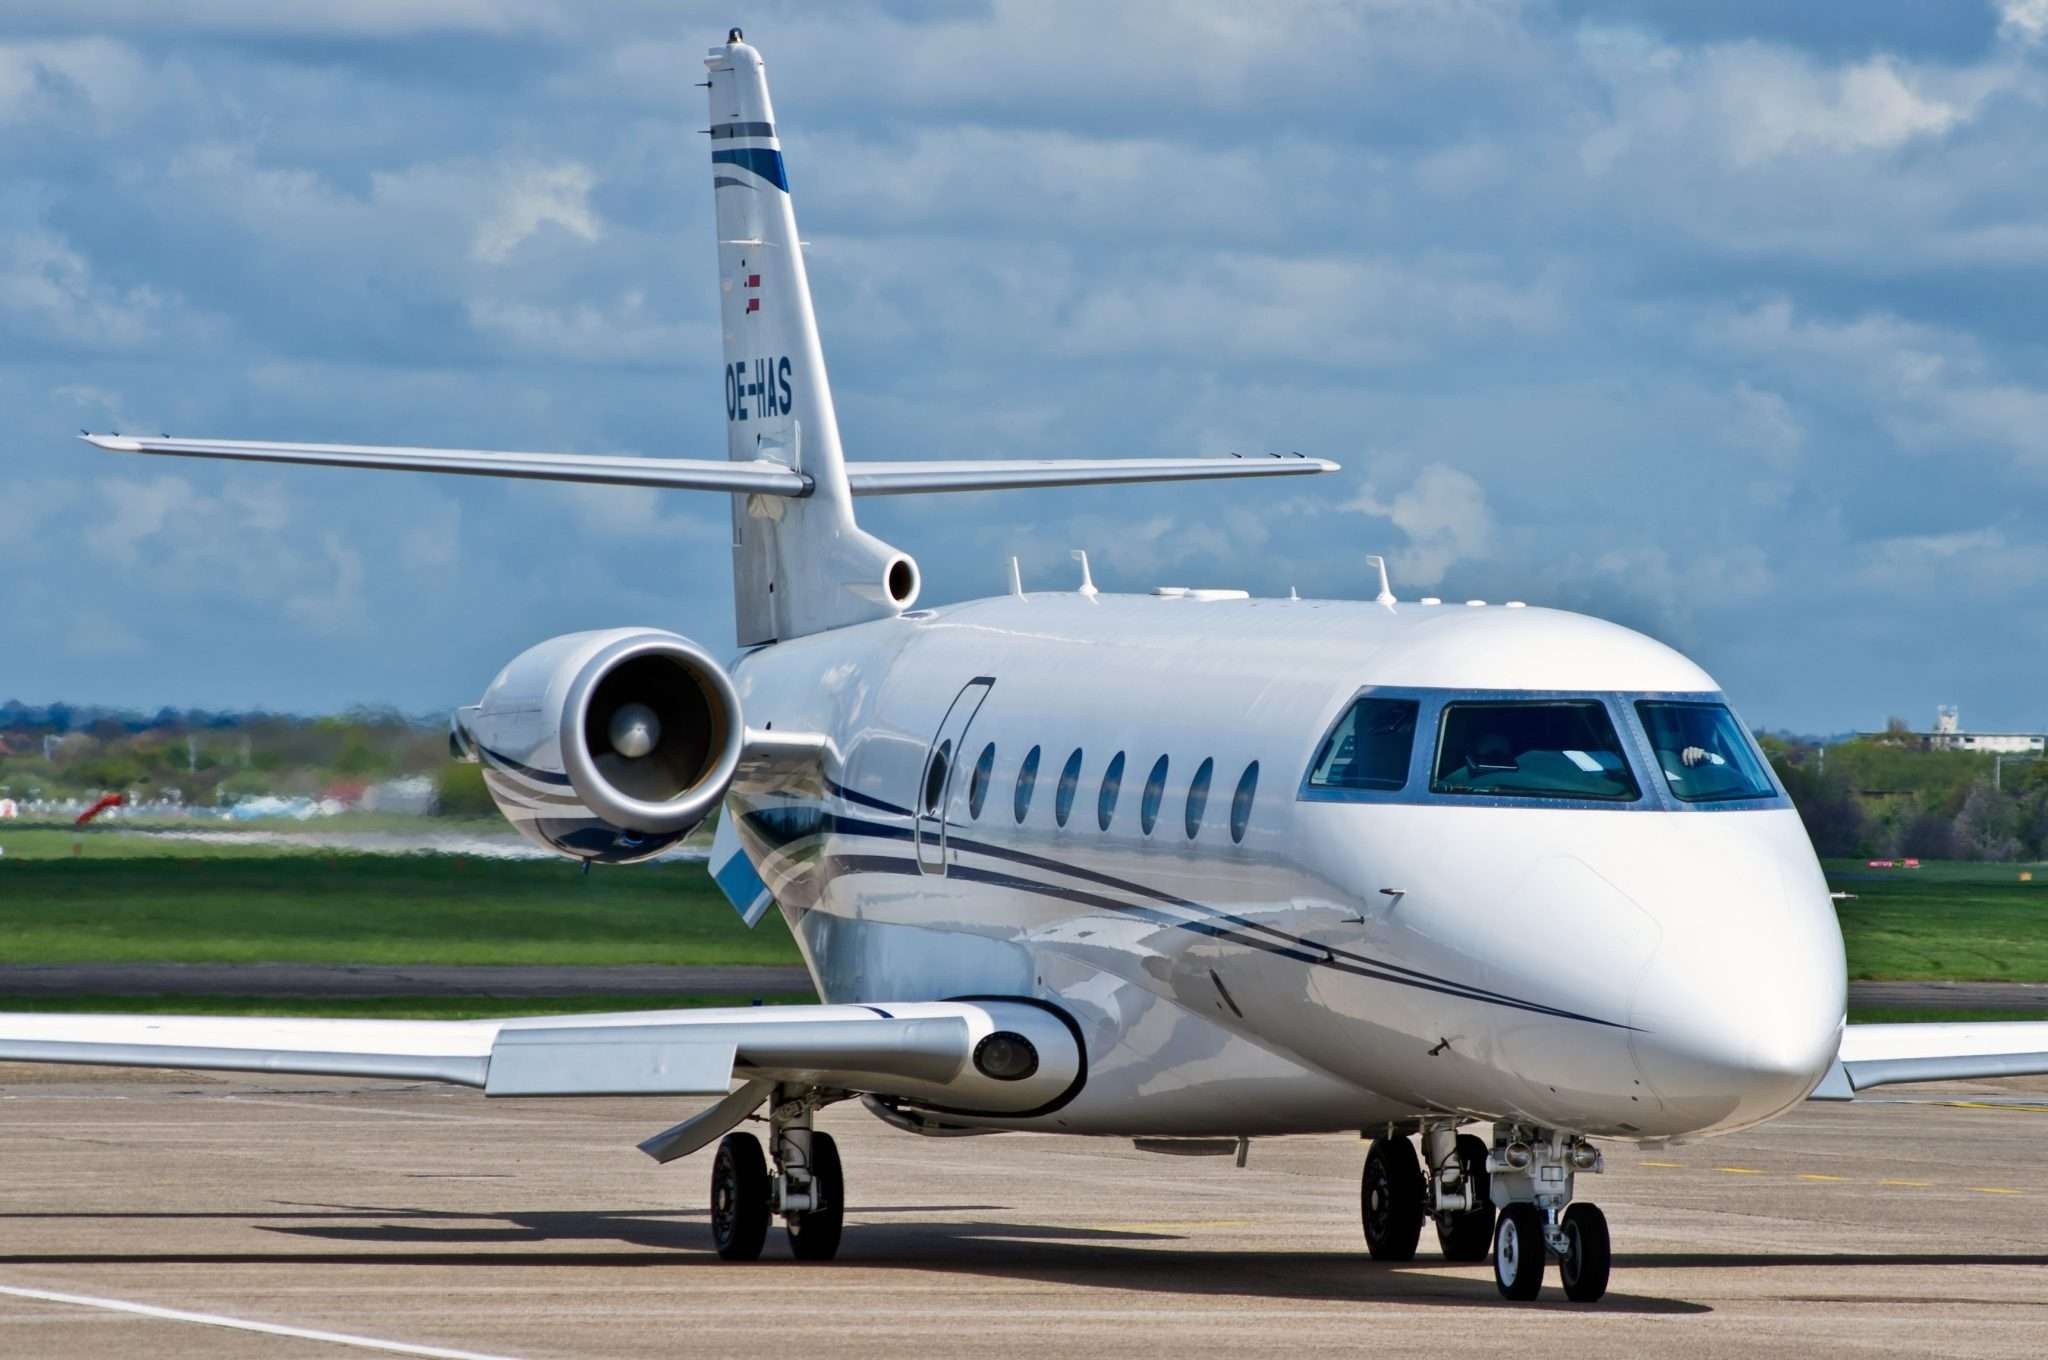 Medical Emergency Air Travel